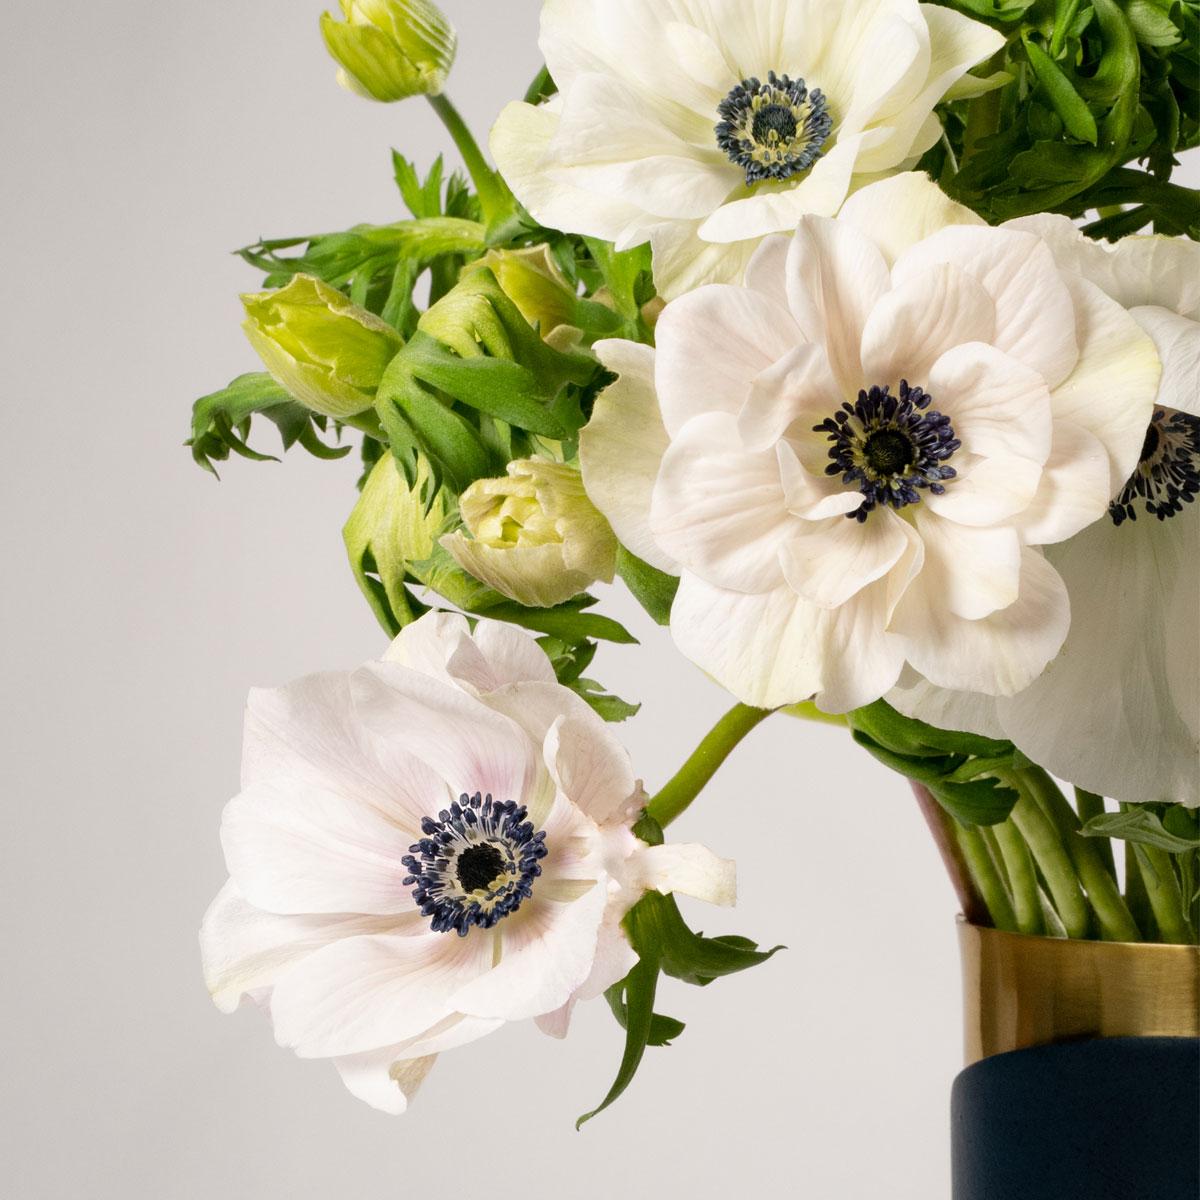 Bloom Flower Delivery | Porcelain White Anemones